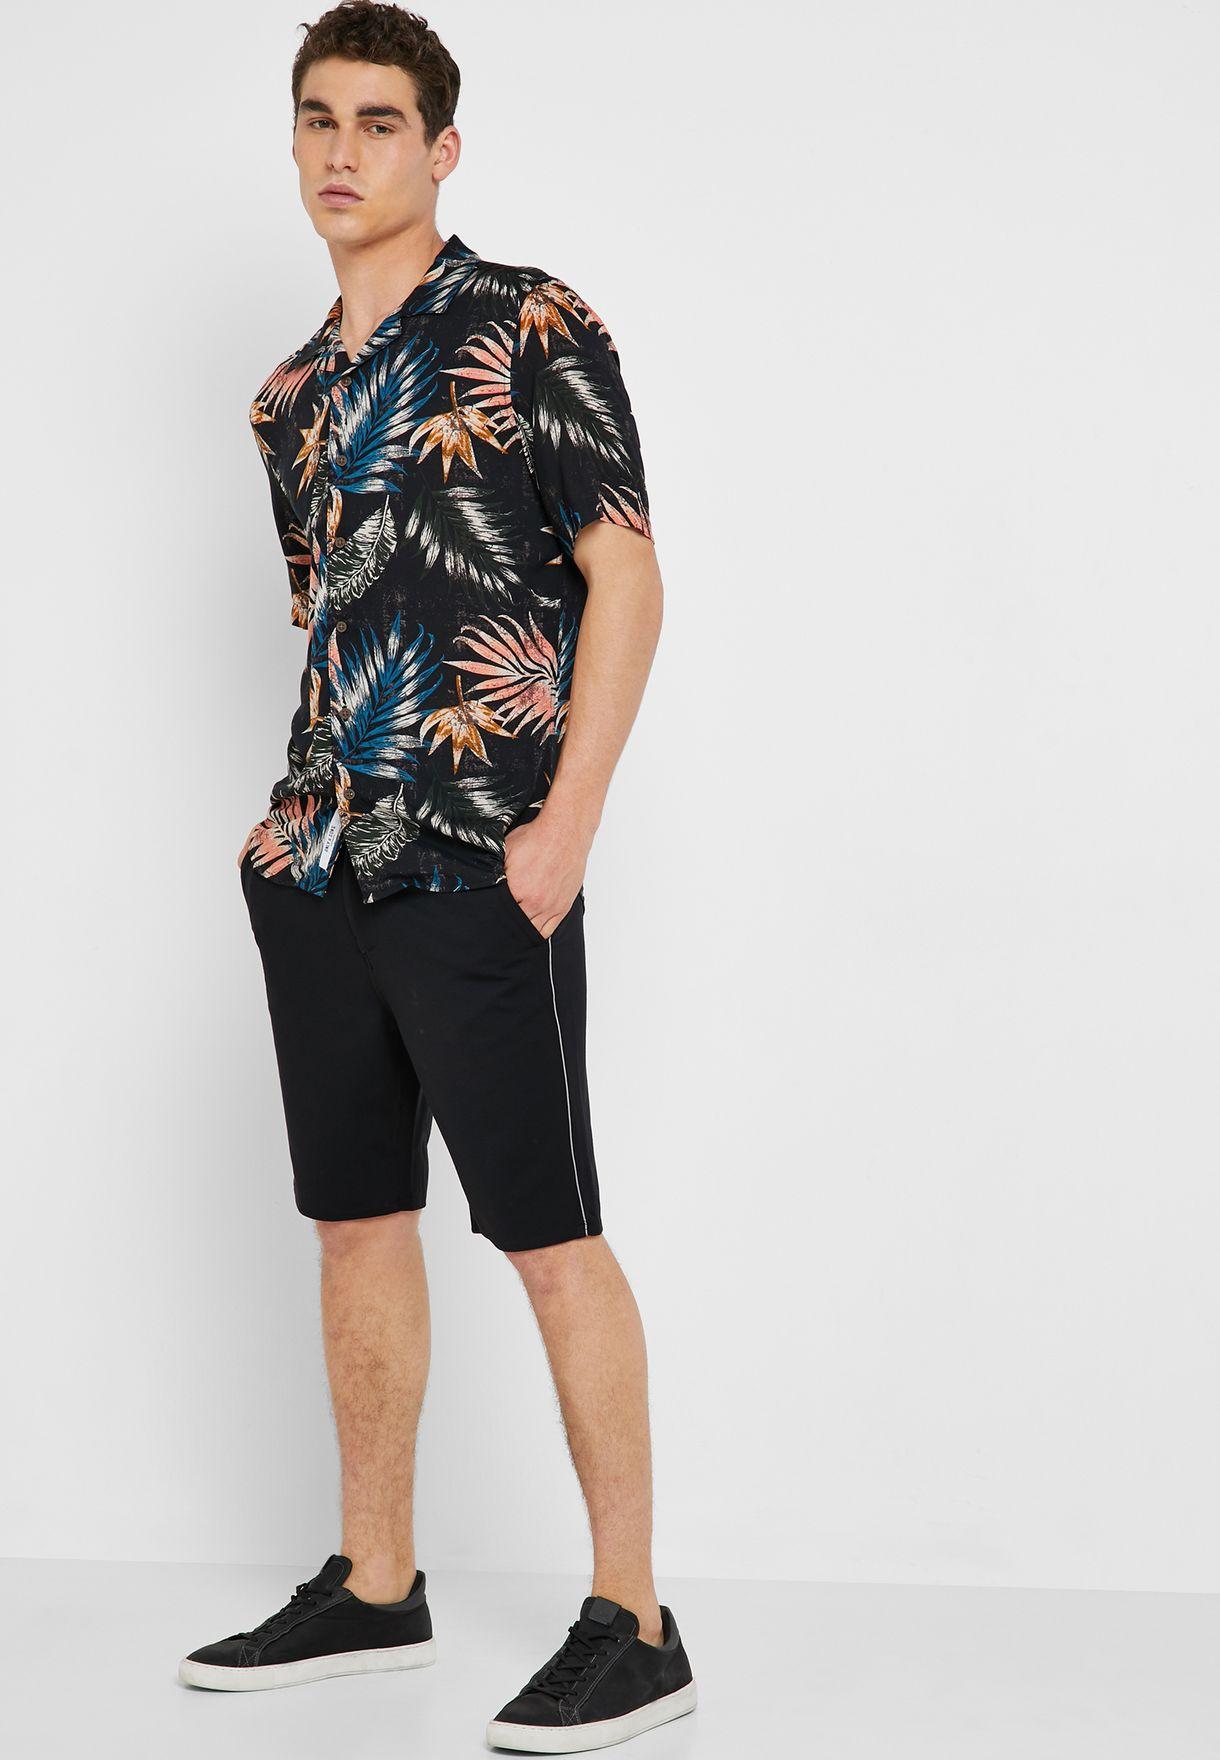 Aged Stripe Shorts